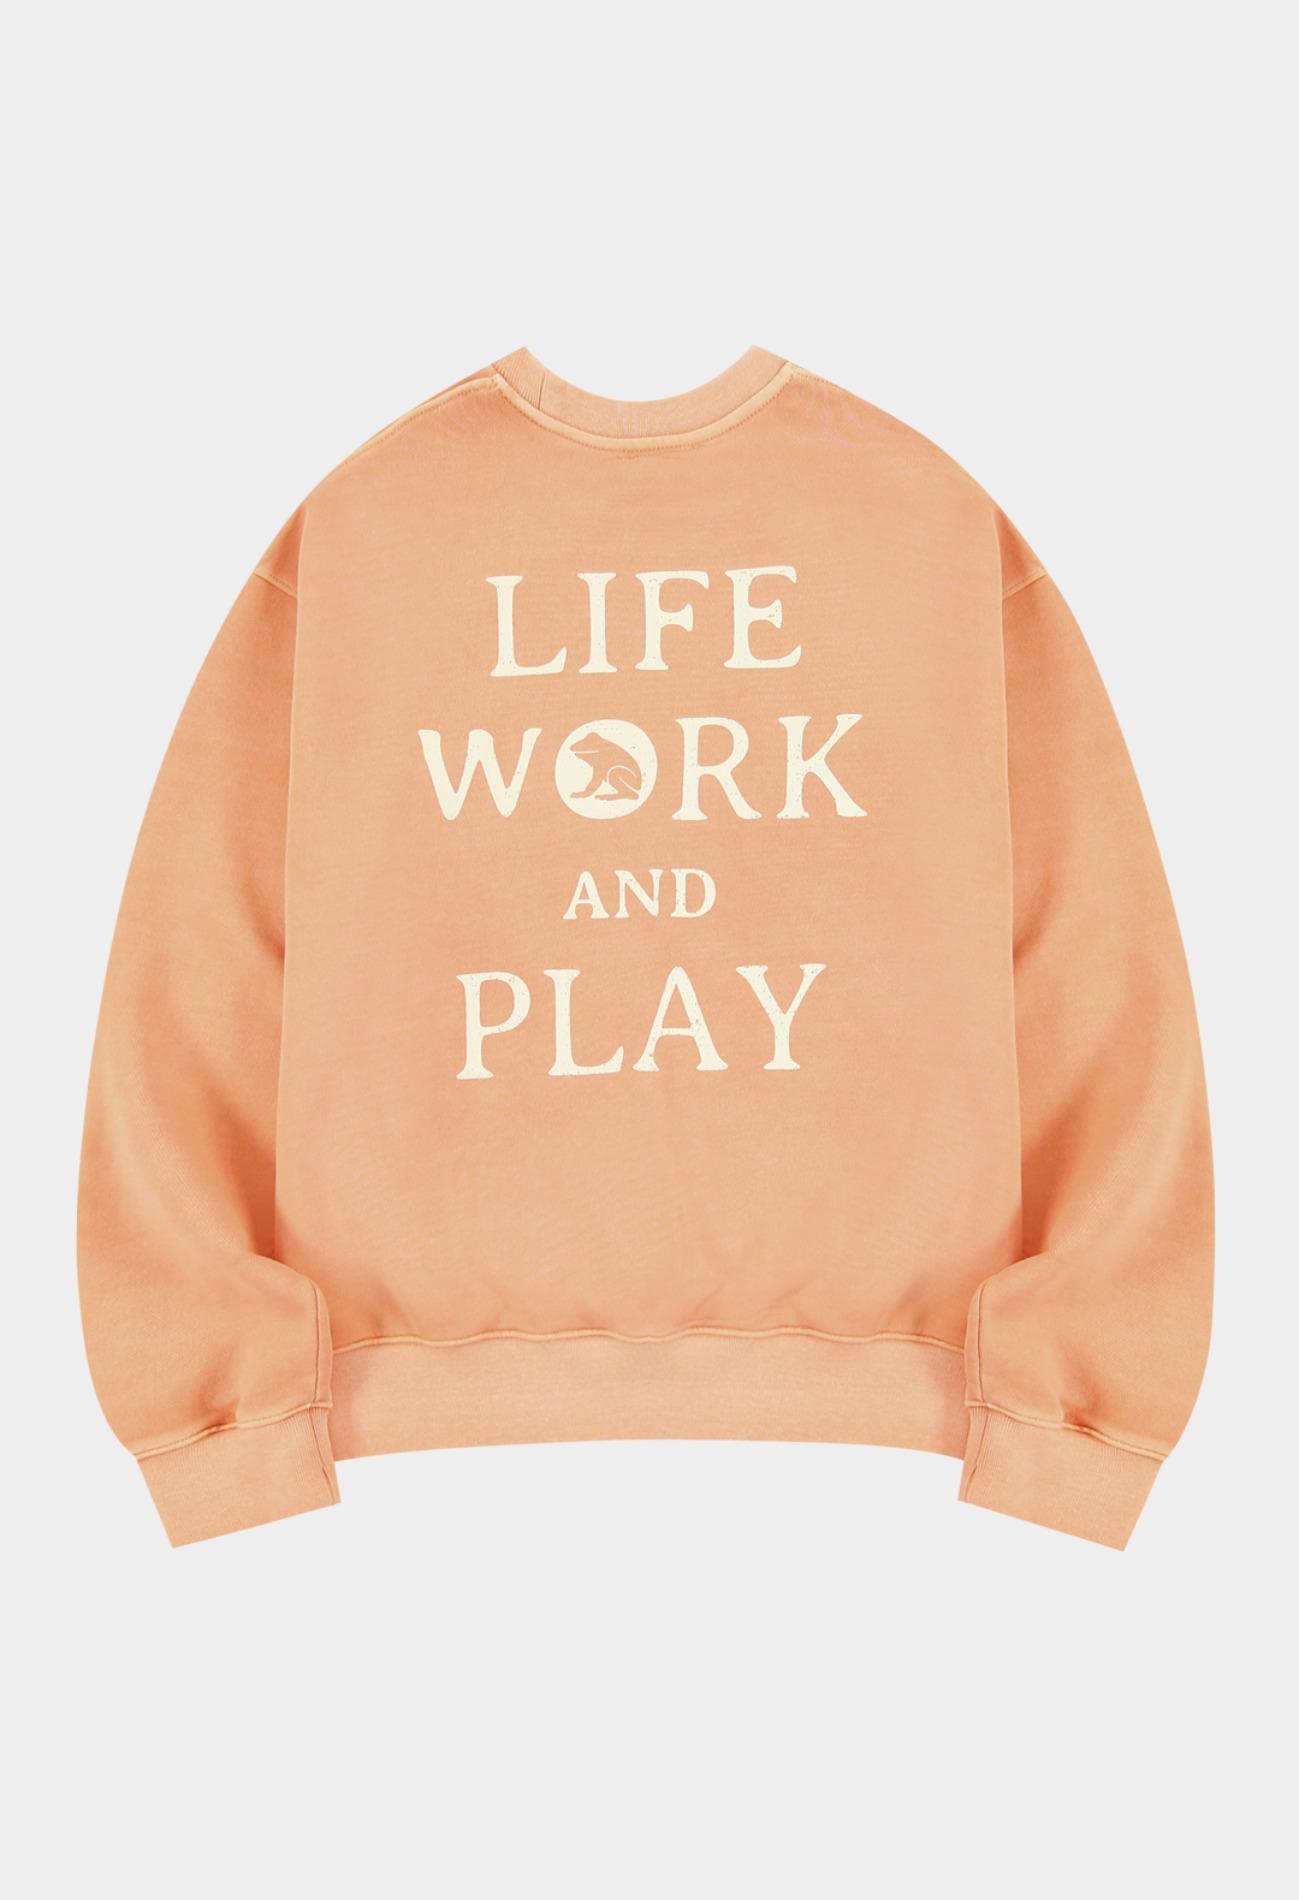 keek Pigment Sweatshirts by KEEK CREW - V/Orange 스트릿패션 유니섹스브랜드 커플시밀러룩 남자쇼핑몰 여성의류쇼핑몰 후드티 힙색